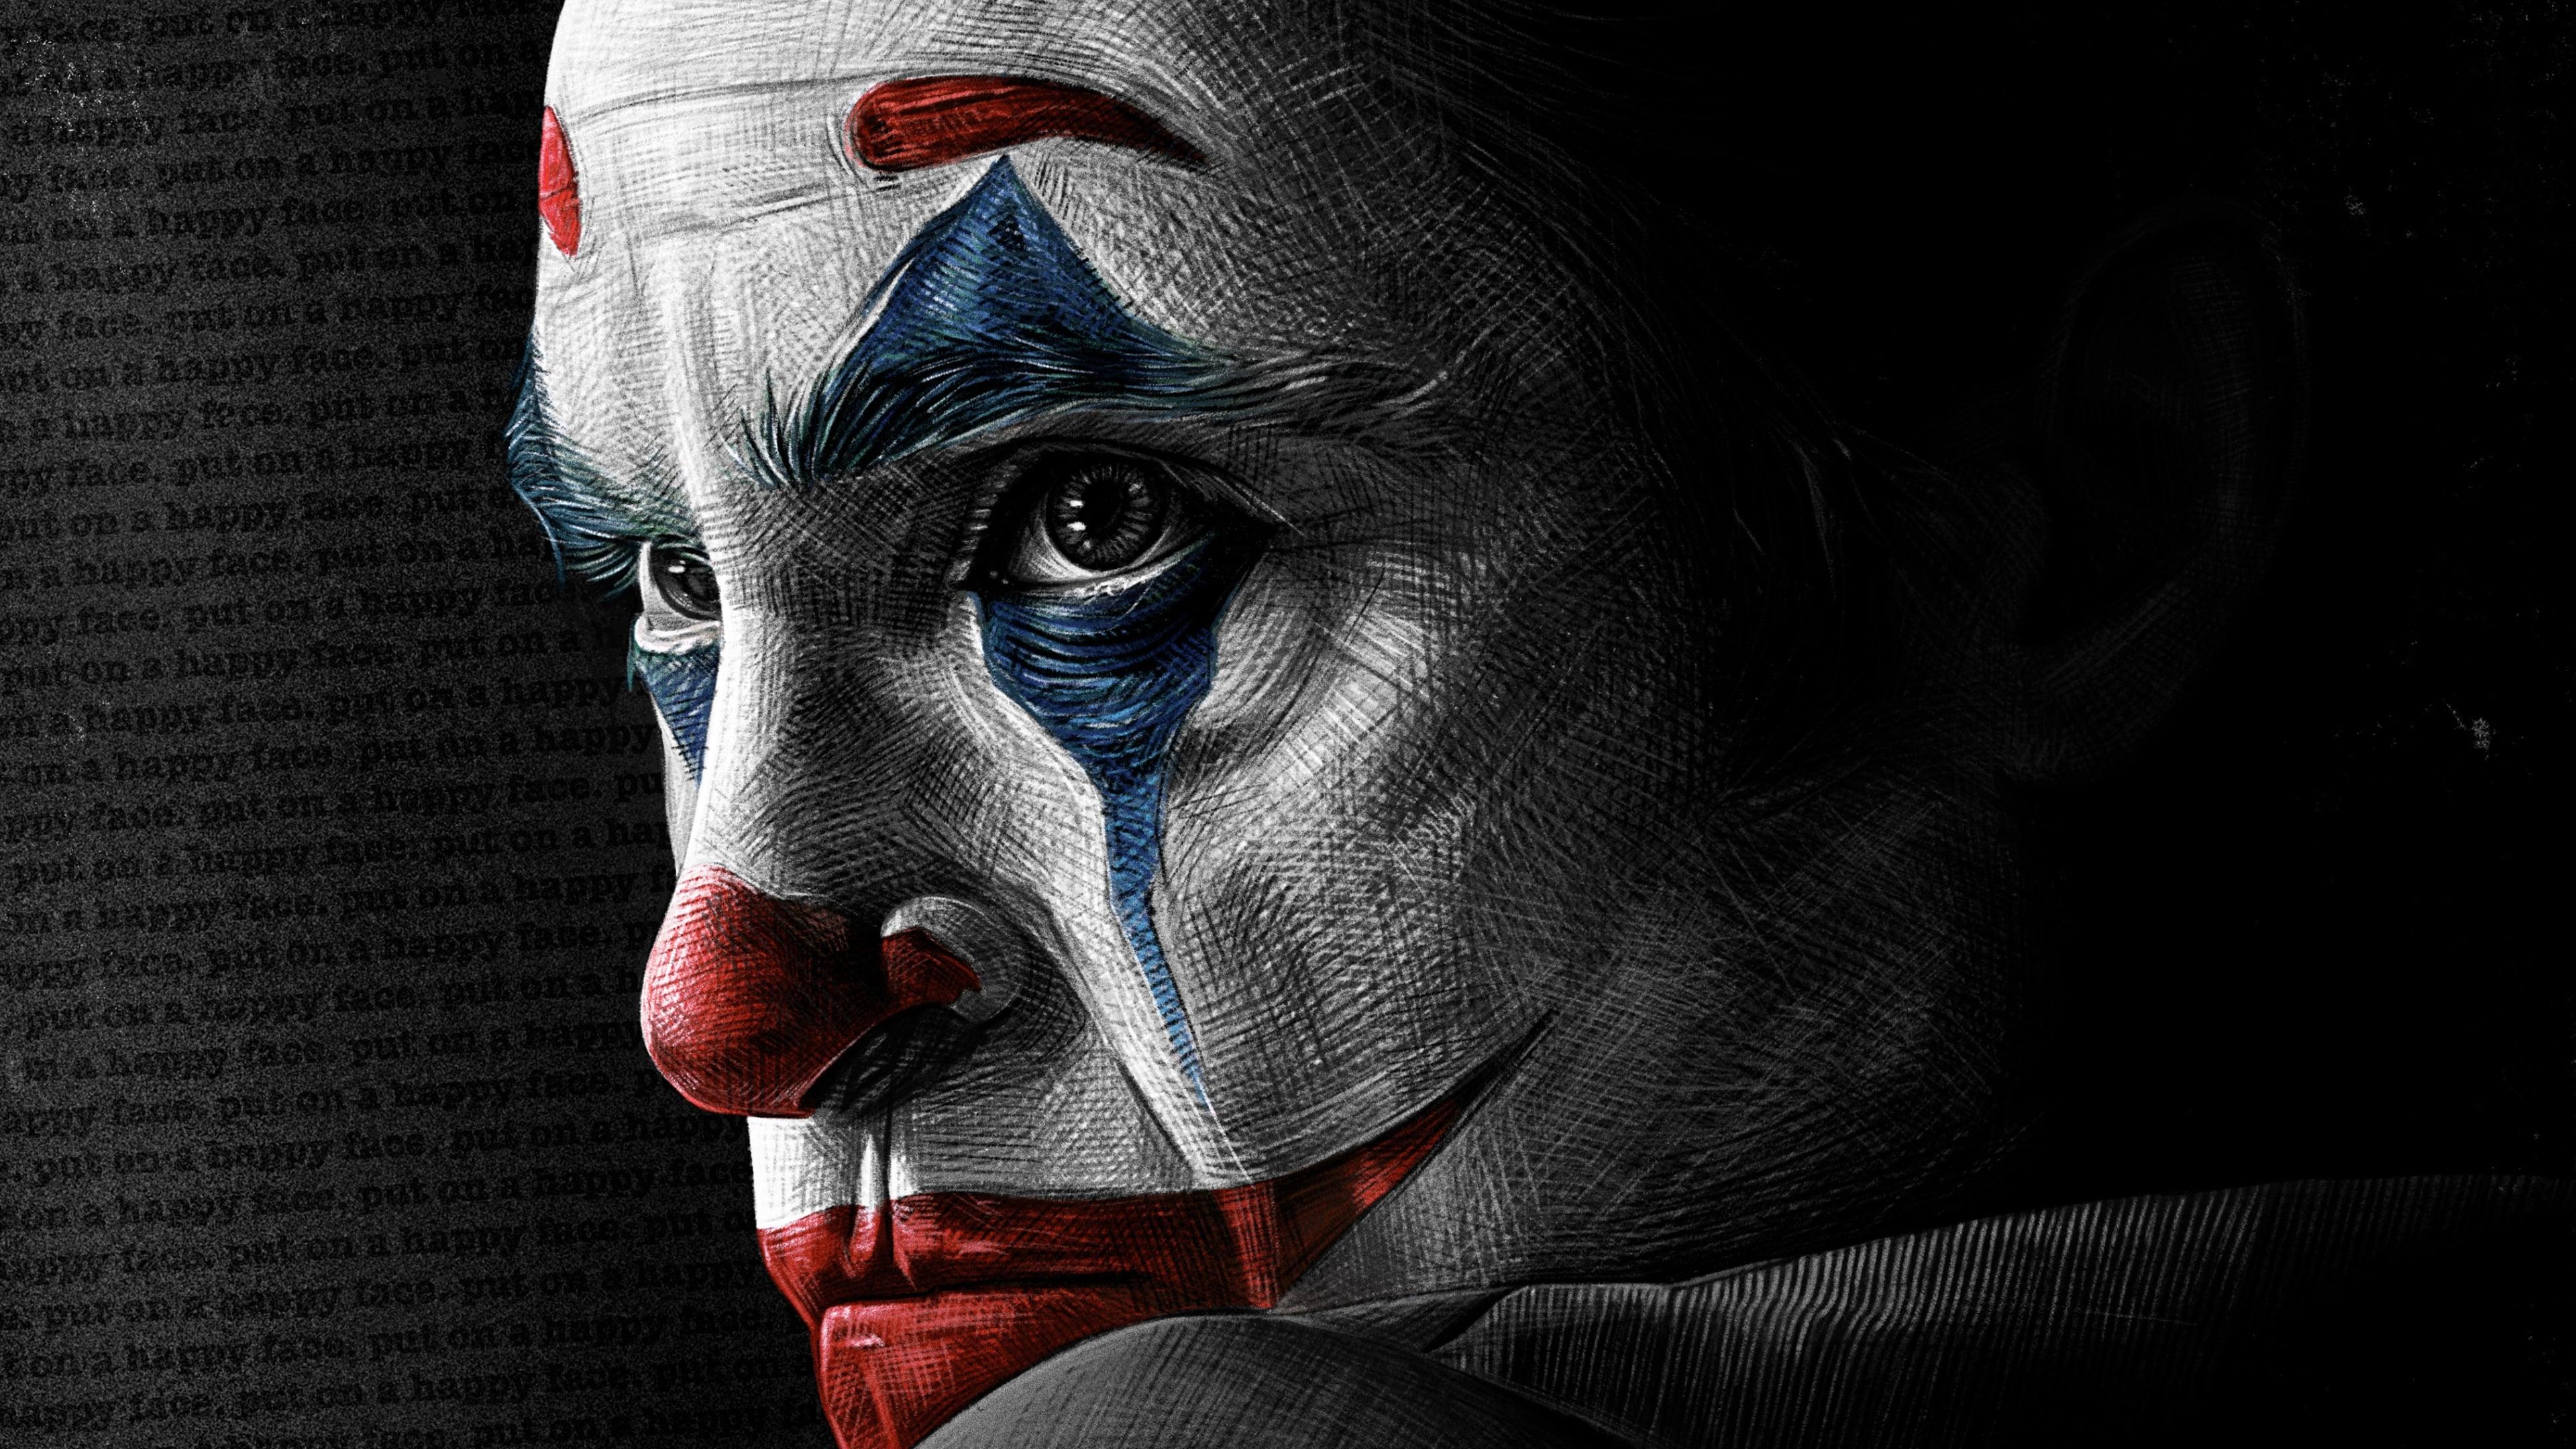 Ver Joker Película Subtitulada Online Completa Hd Gratis